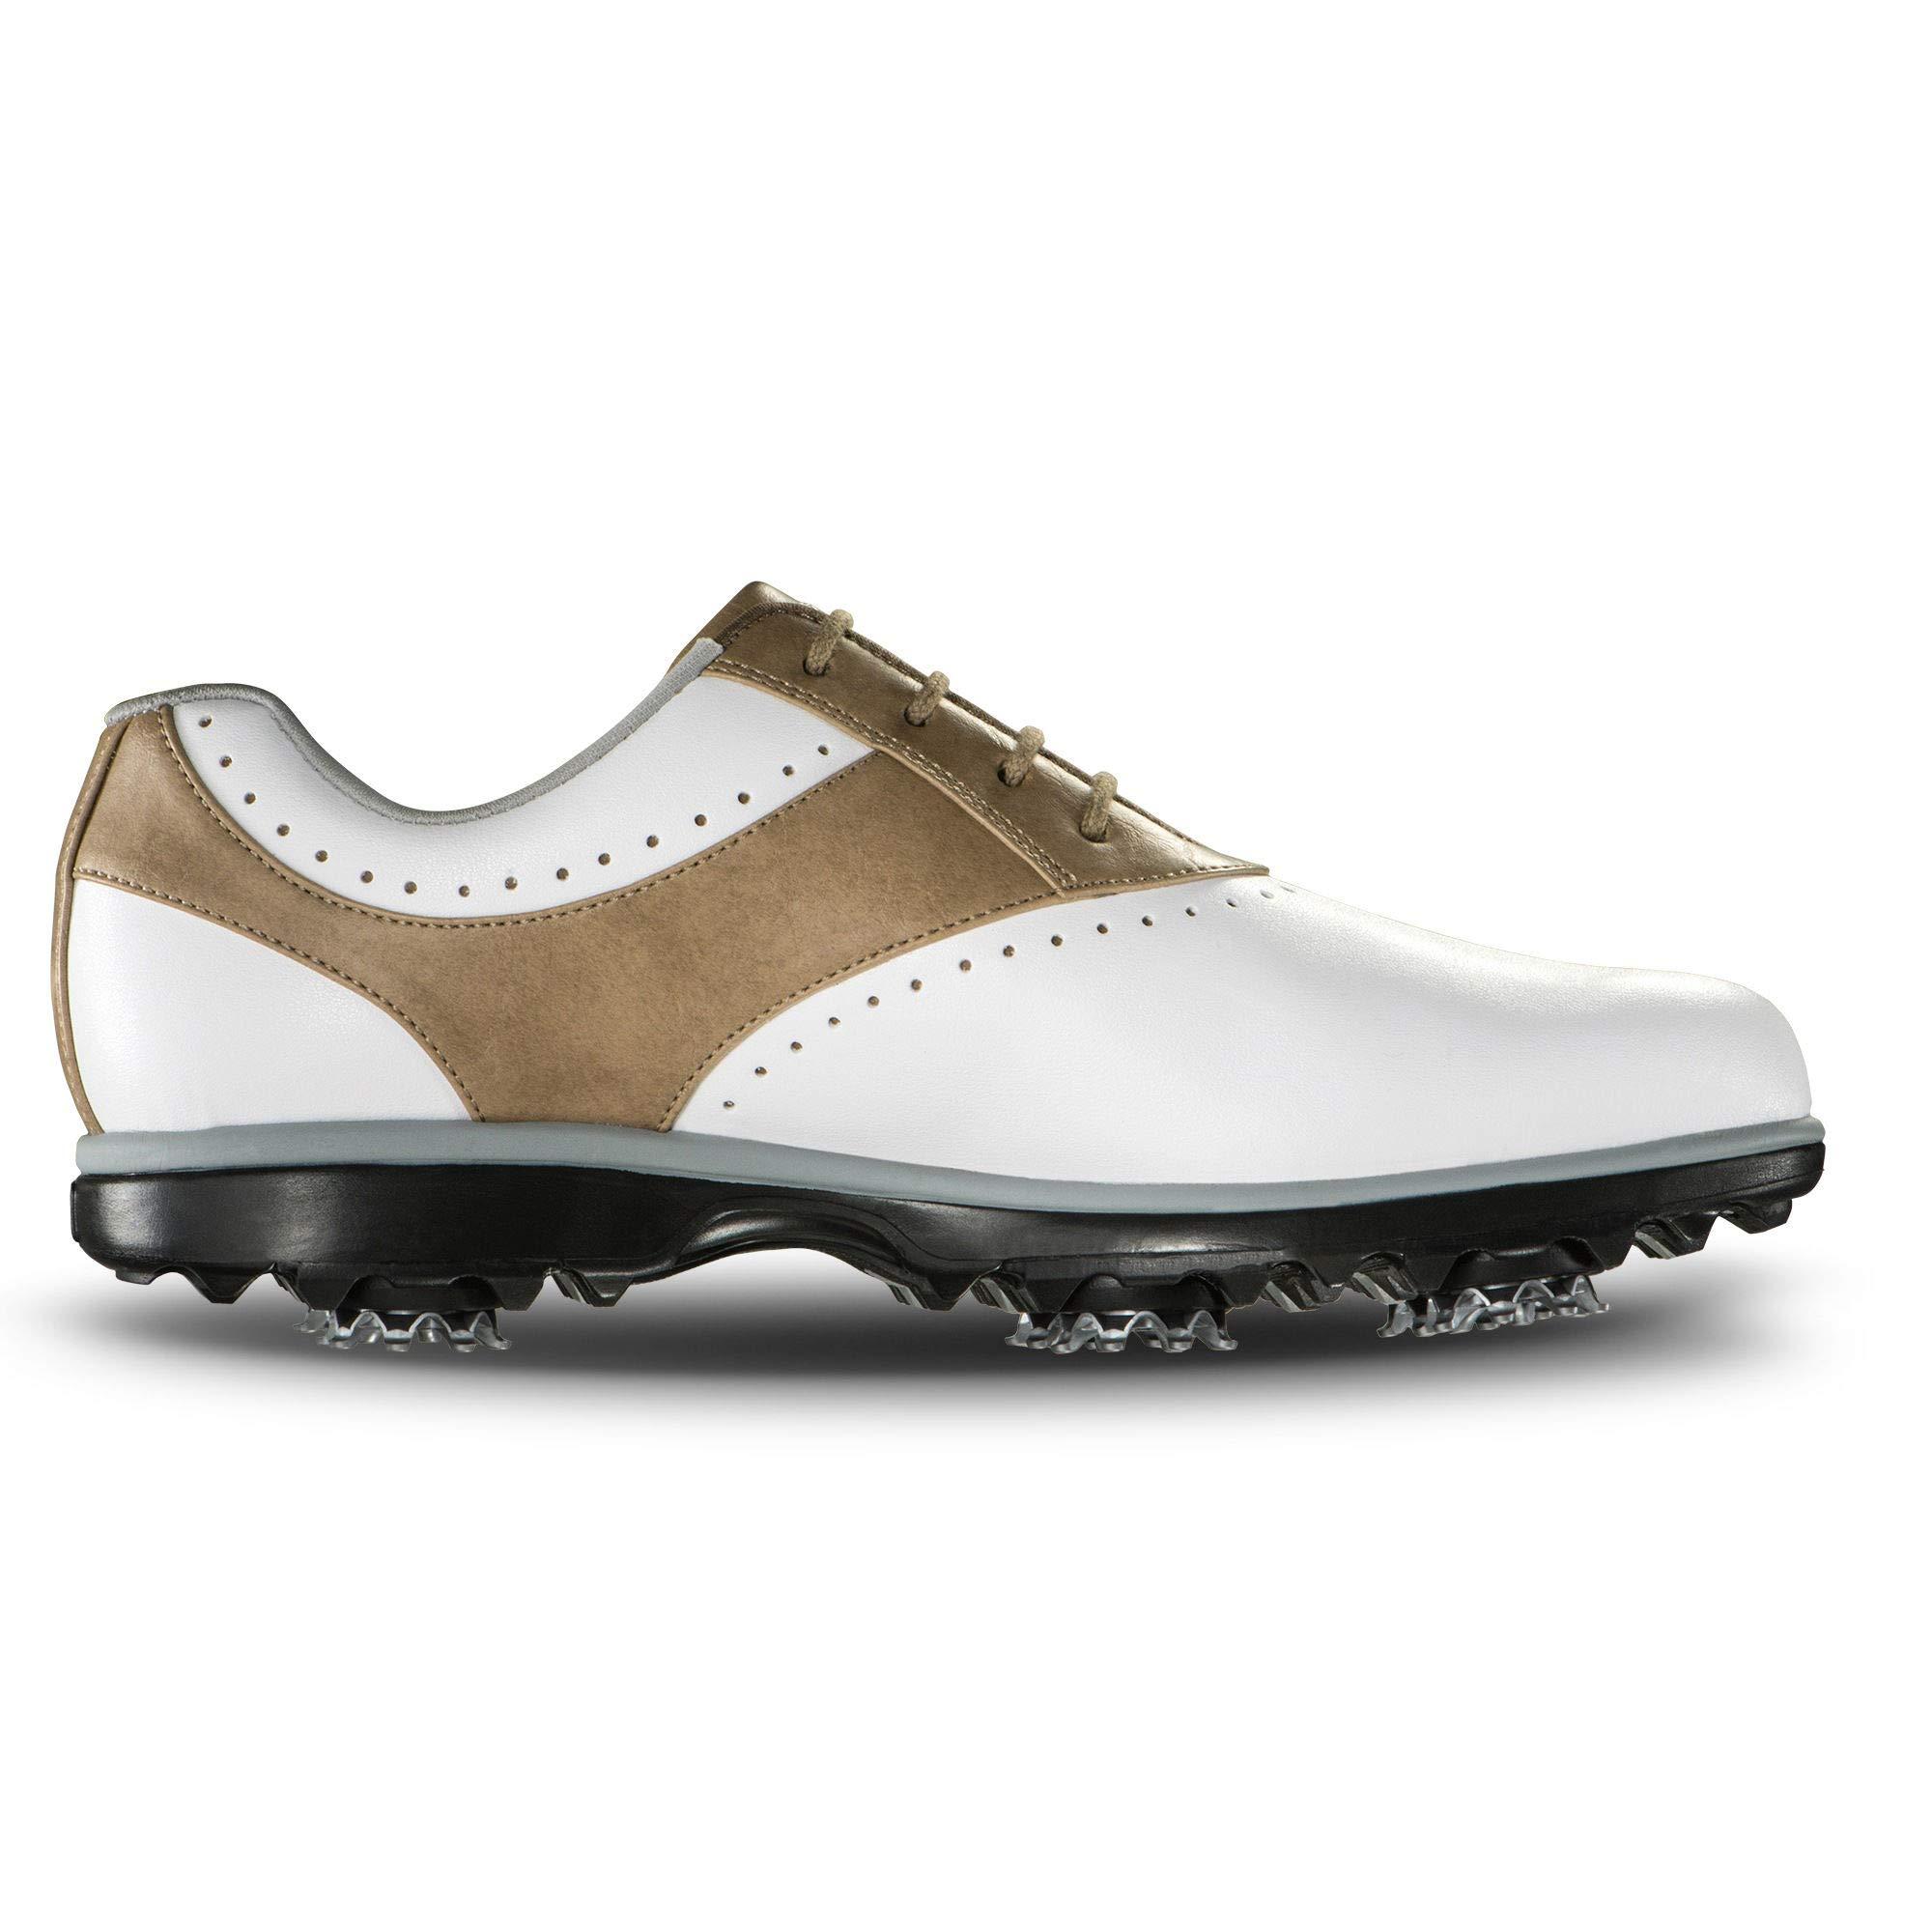 FootJoy Women's Emerge-Previous Season Style Golf Shoes White 6 M Taupe, US by FootJoy